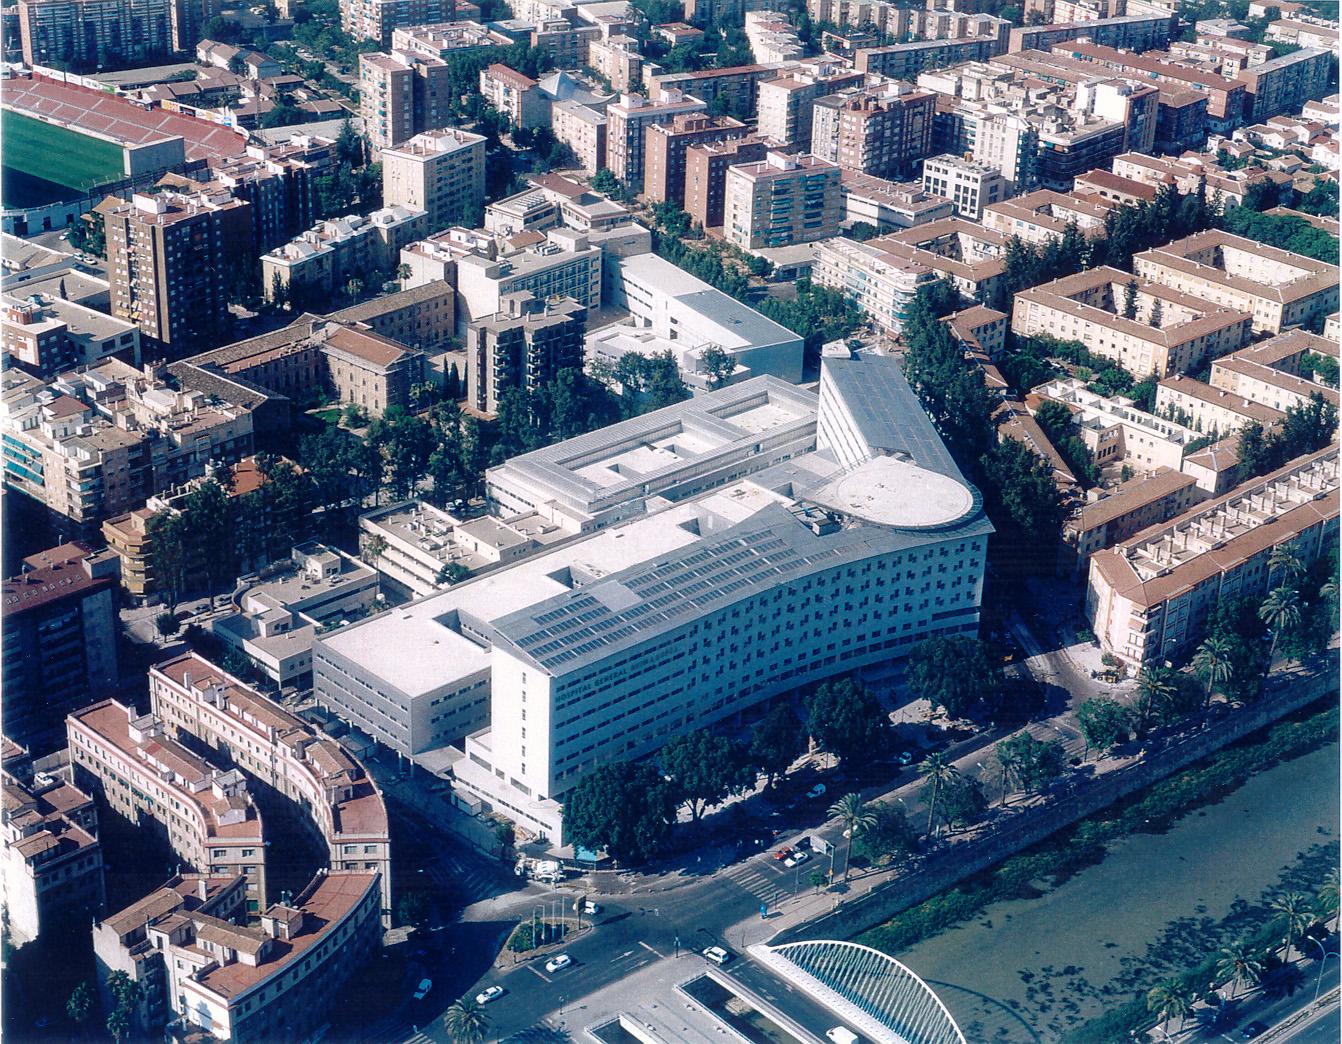 Reina Sofia University Hospital of Murcia